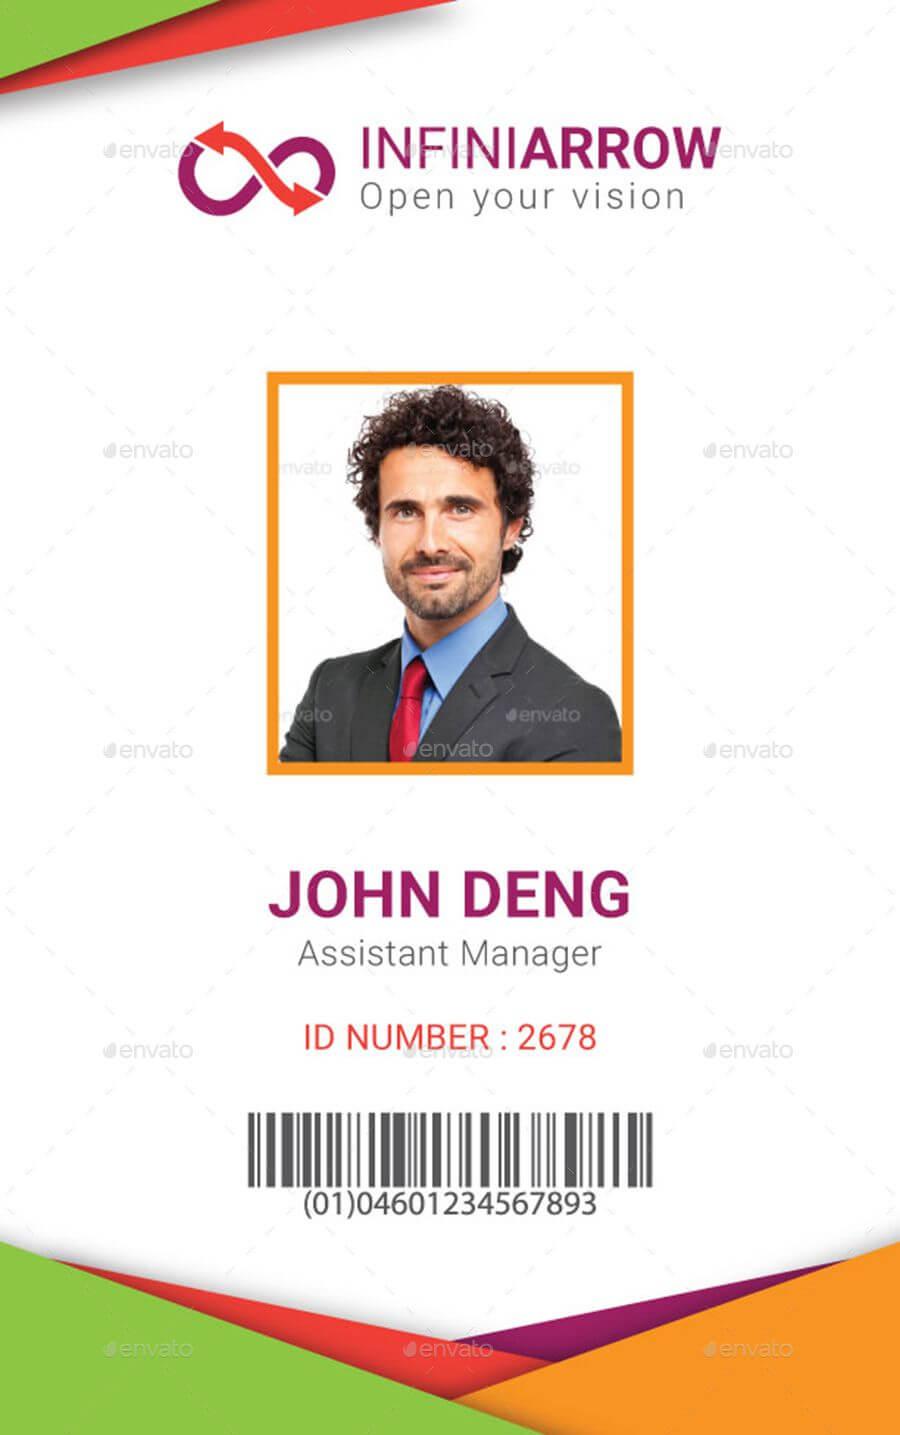 017 Template Ideas Id Card Stirring Photoshop School Free pertaining to High School Id Card Template